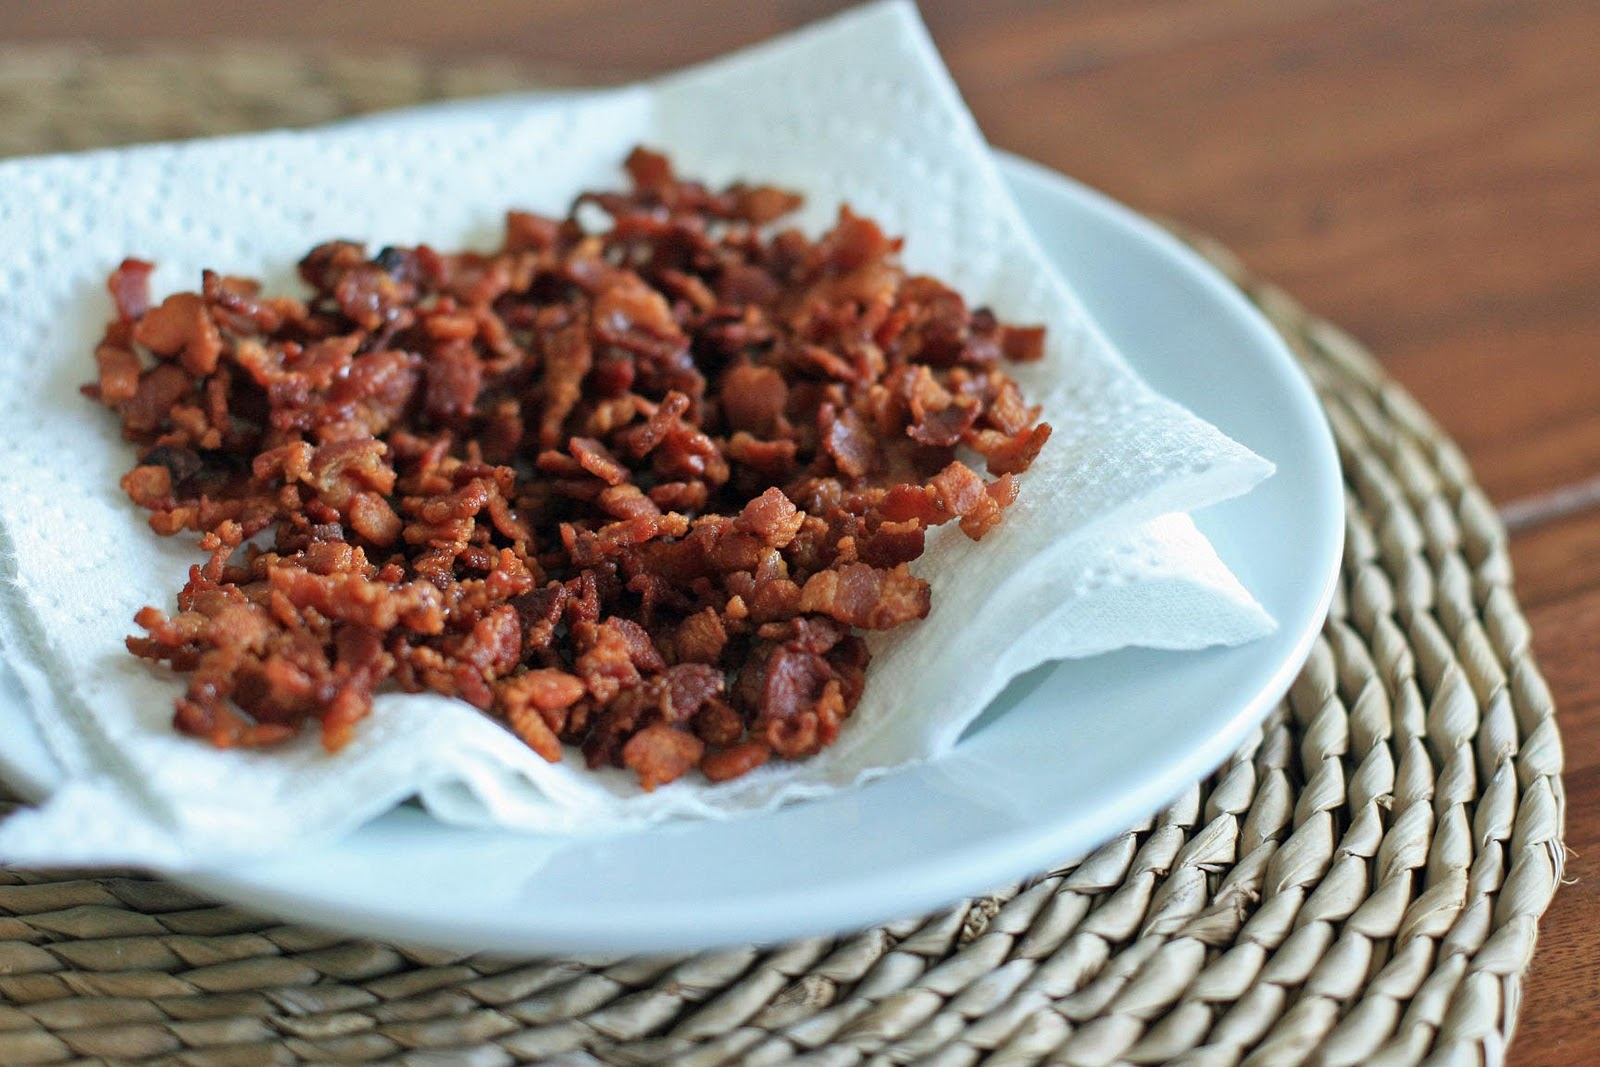 Smoky Bacon and Cheddar Shrimp and Grits